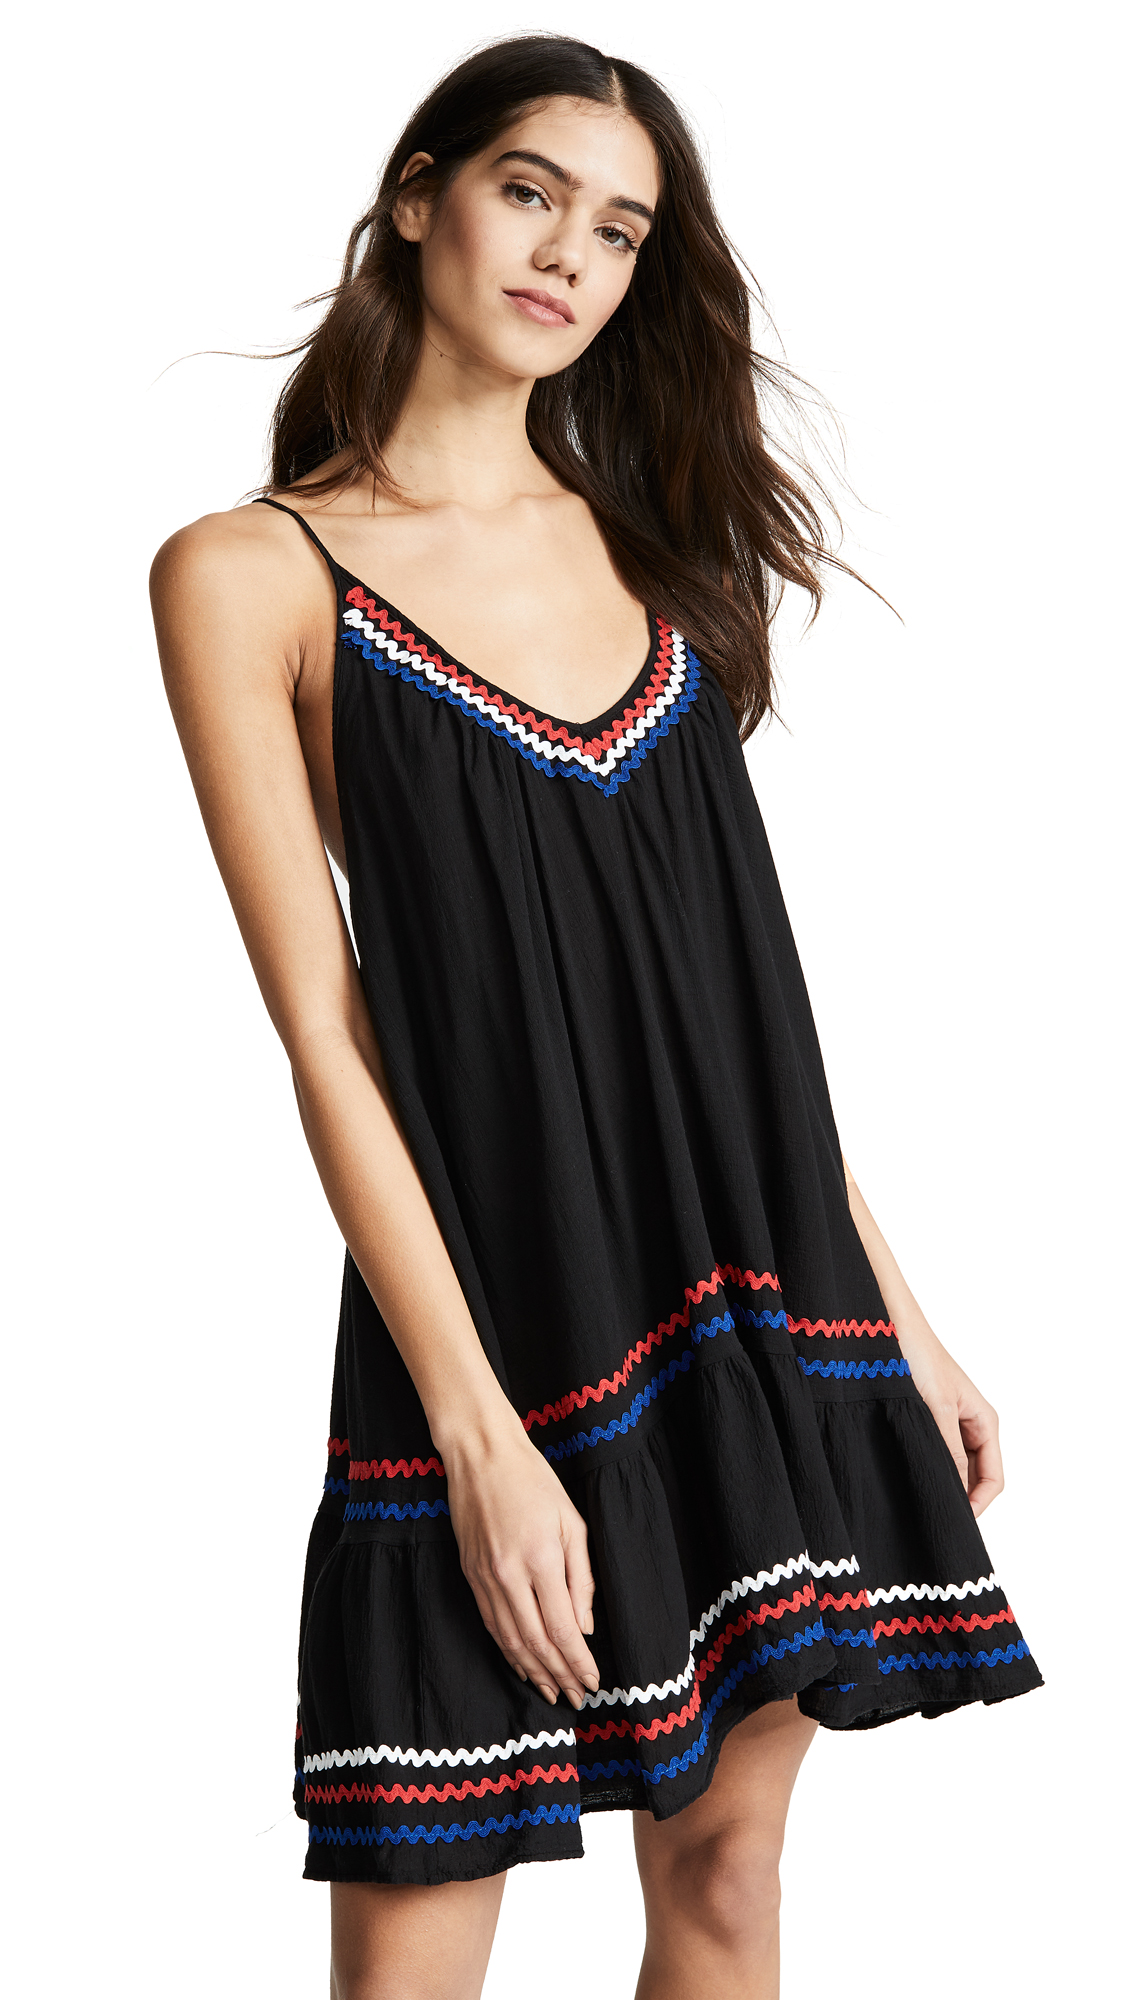 9SEED St Tropez Ruffle Mini Dress in Black/Multi